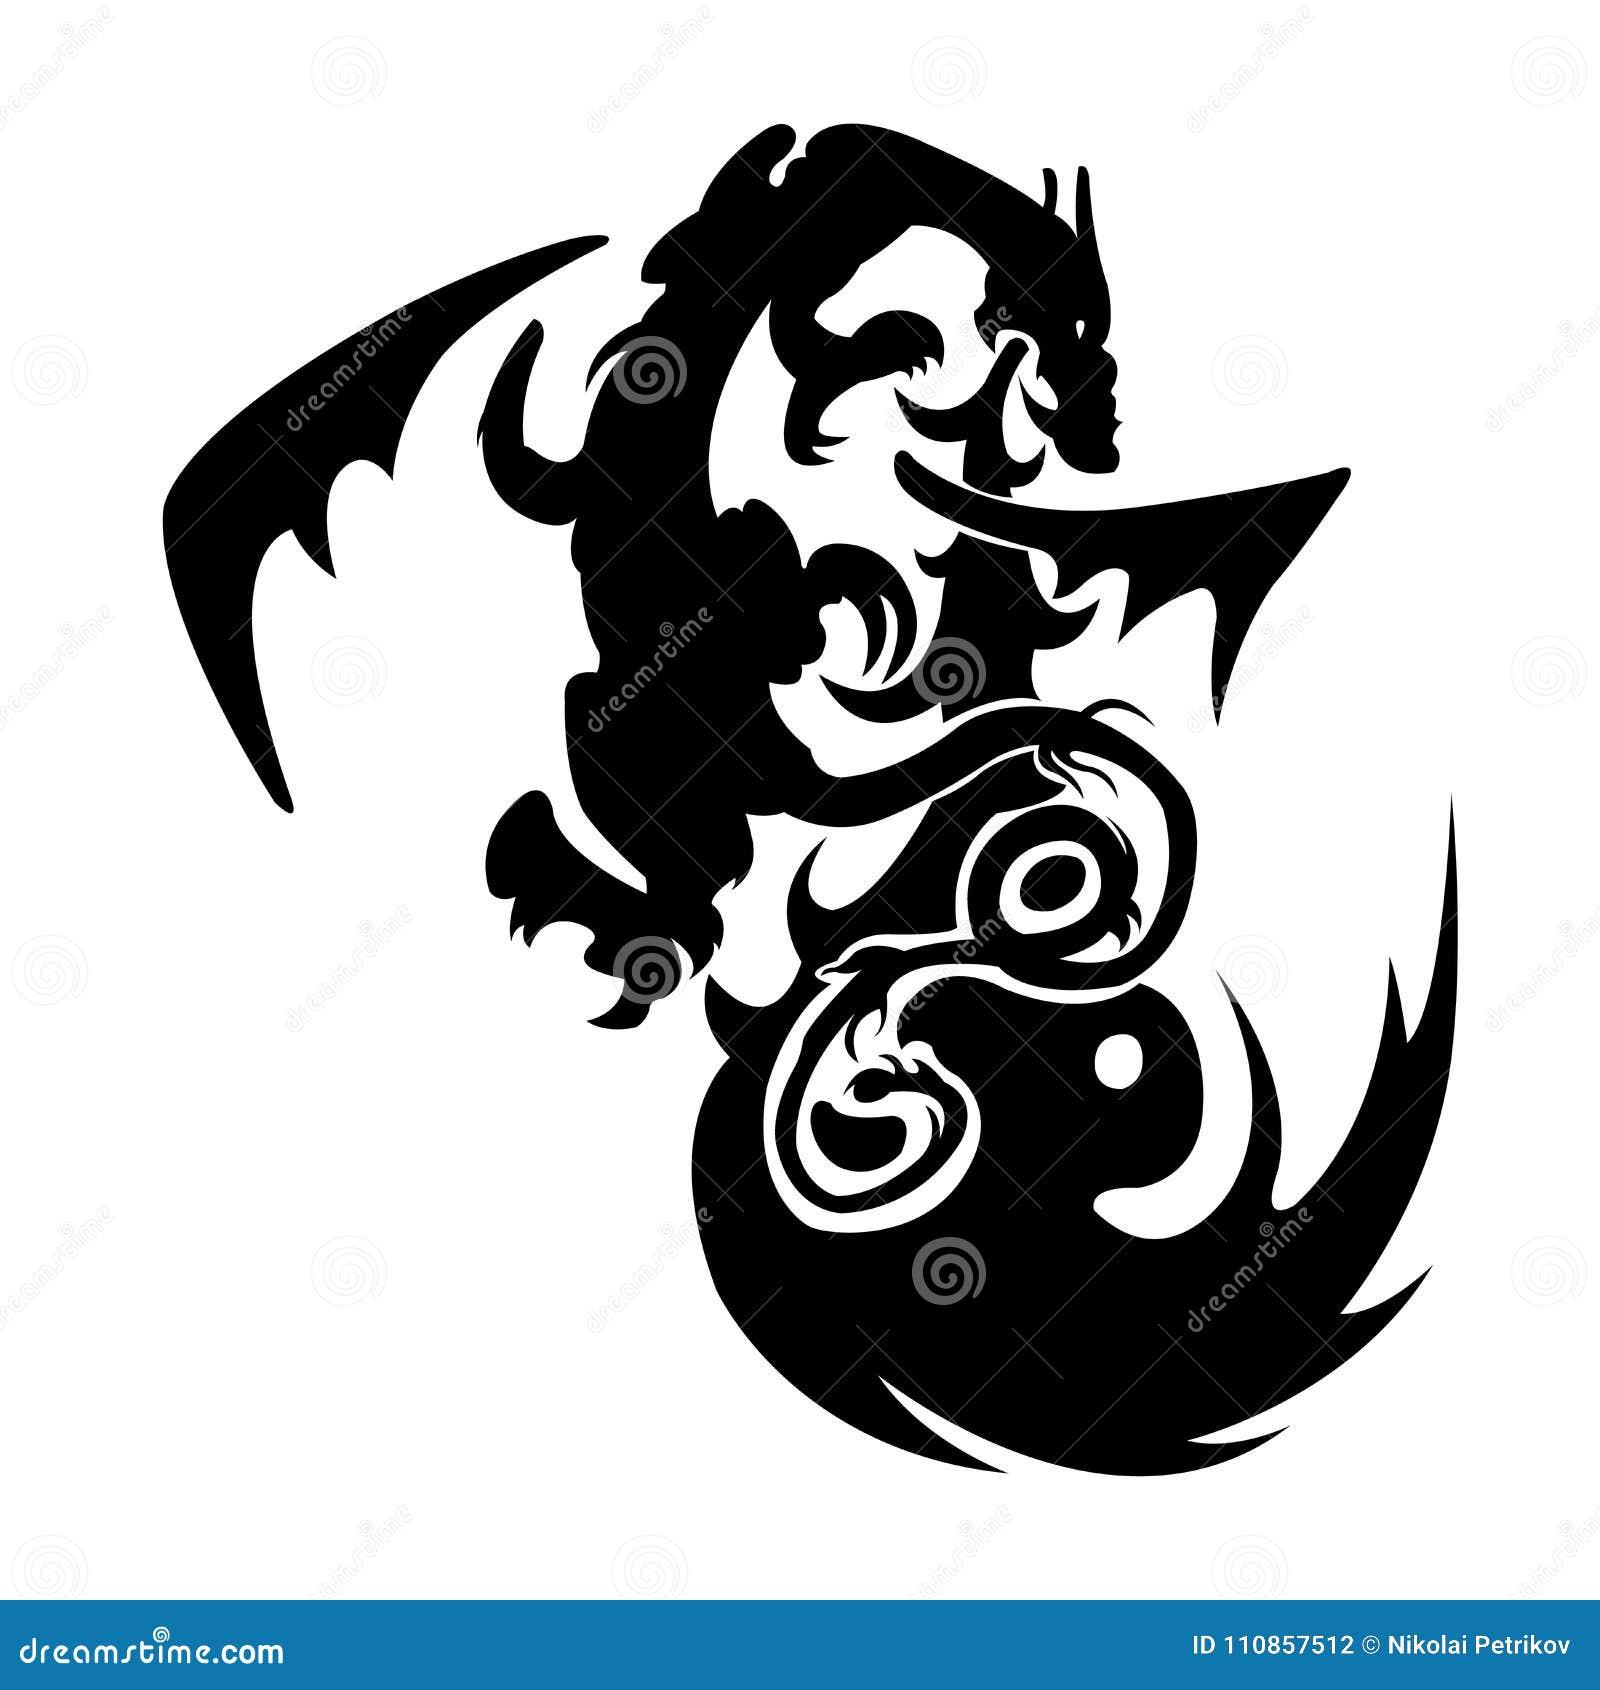 tatouage de dragon stock illustrations vecteurs. Black Bedroom Furniture Sets. Home Design Ideas